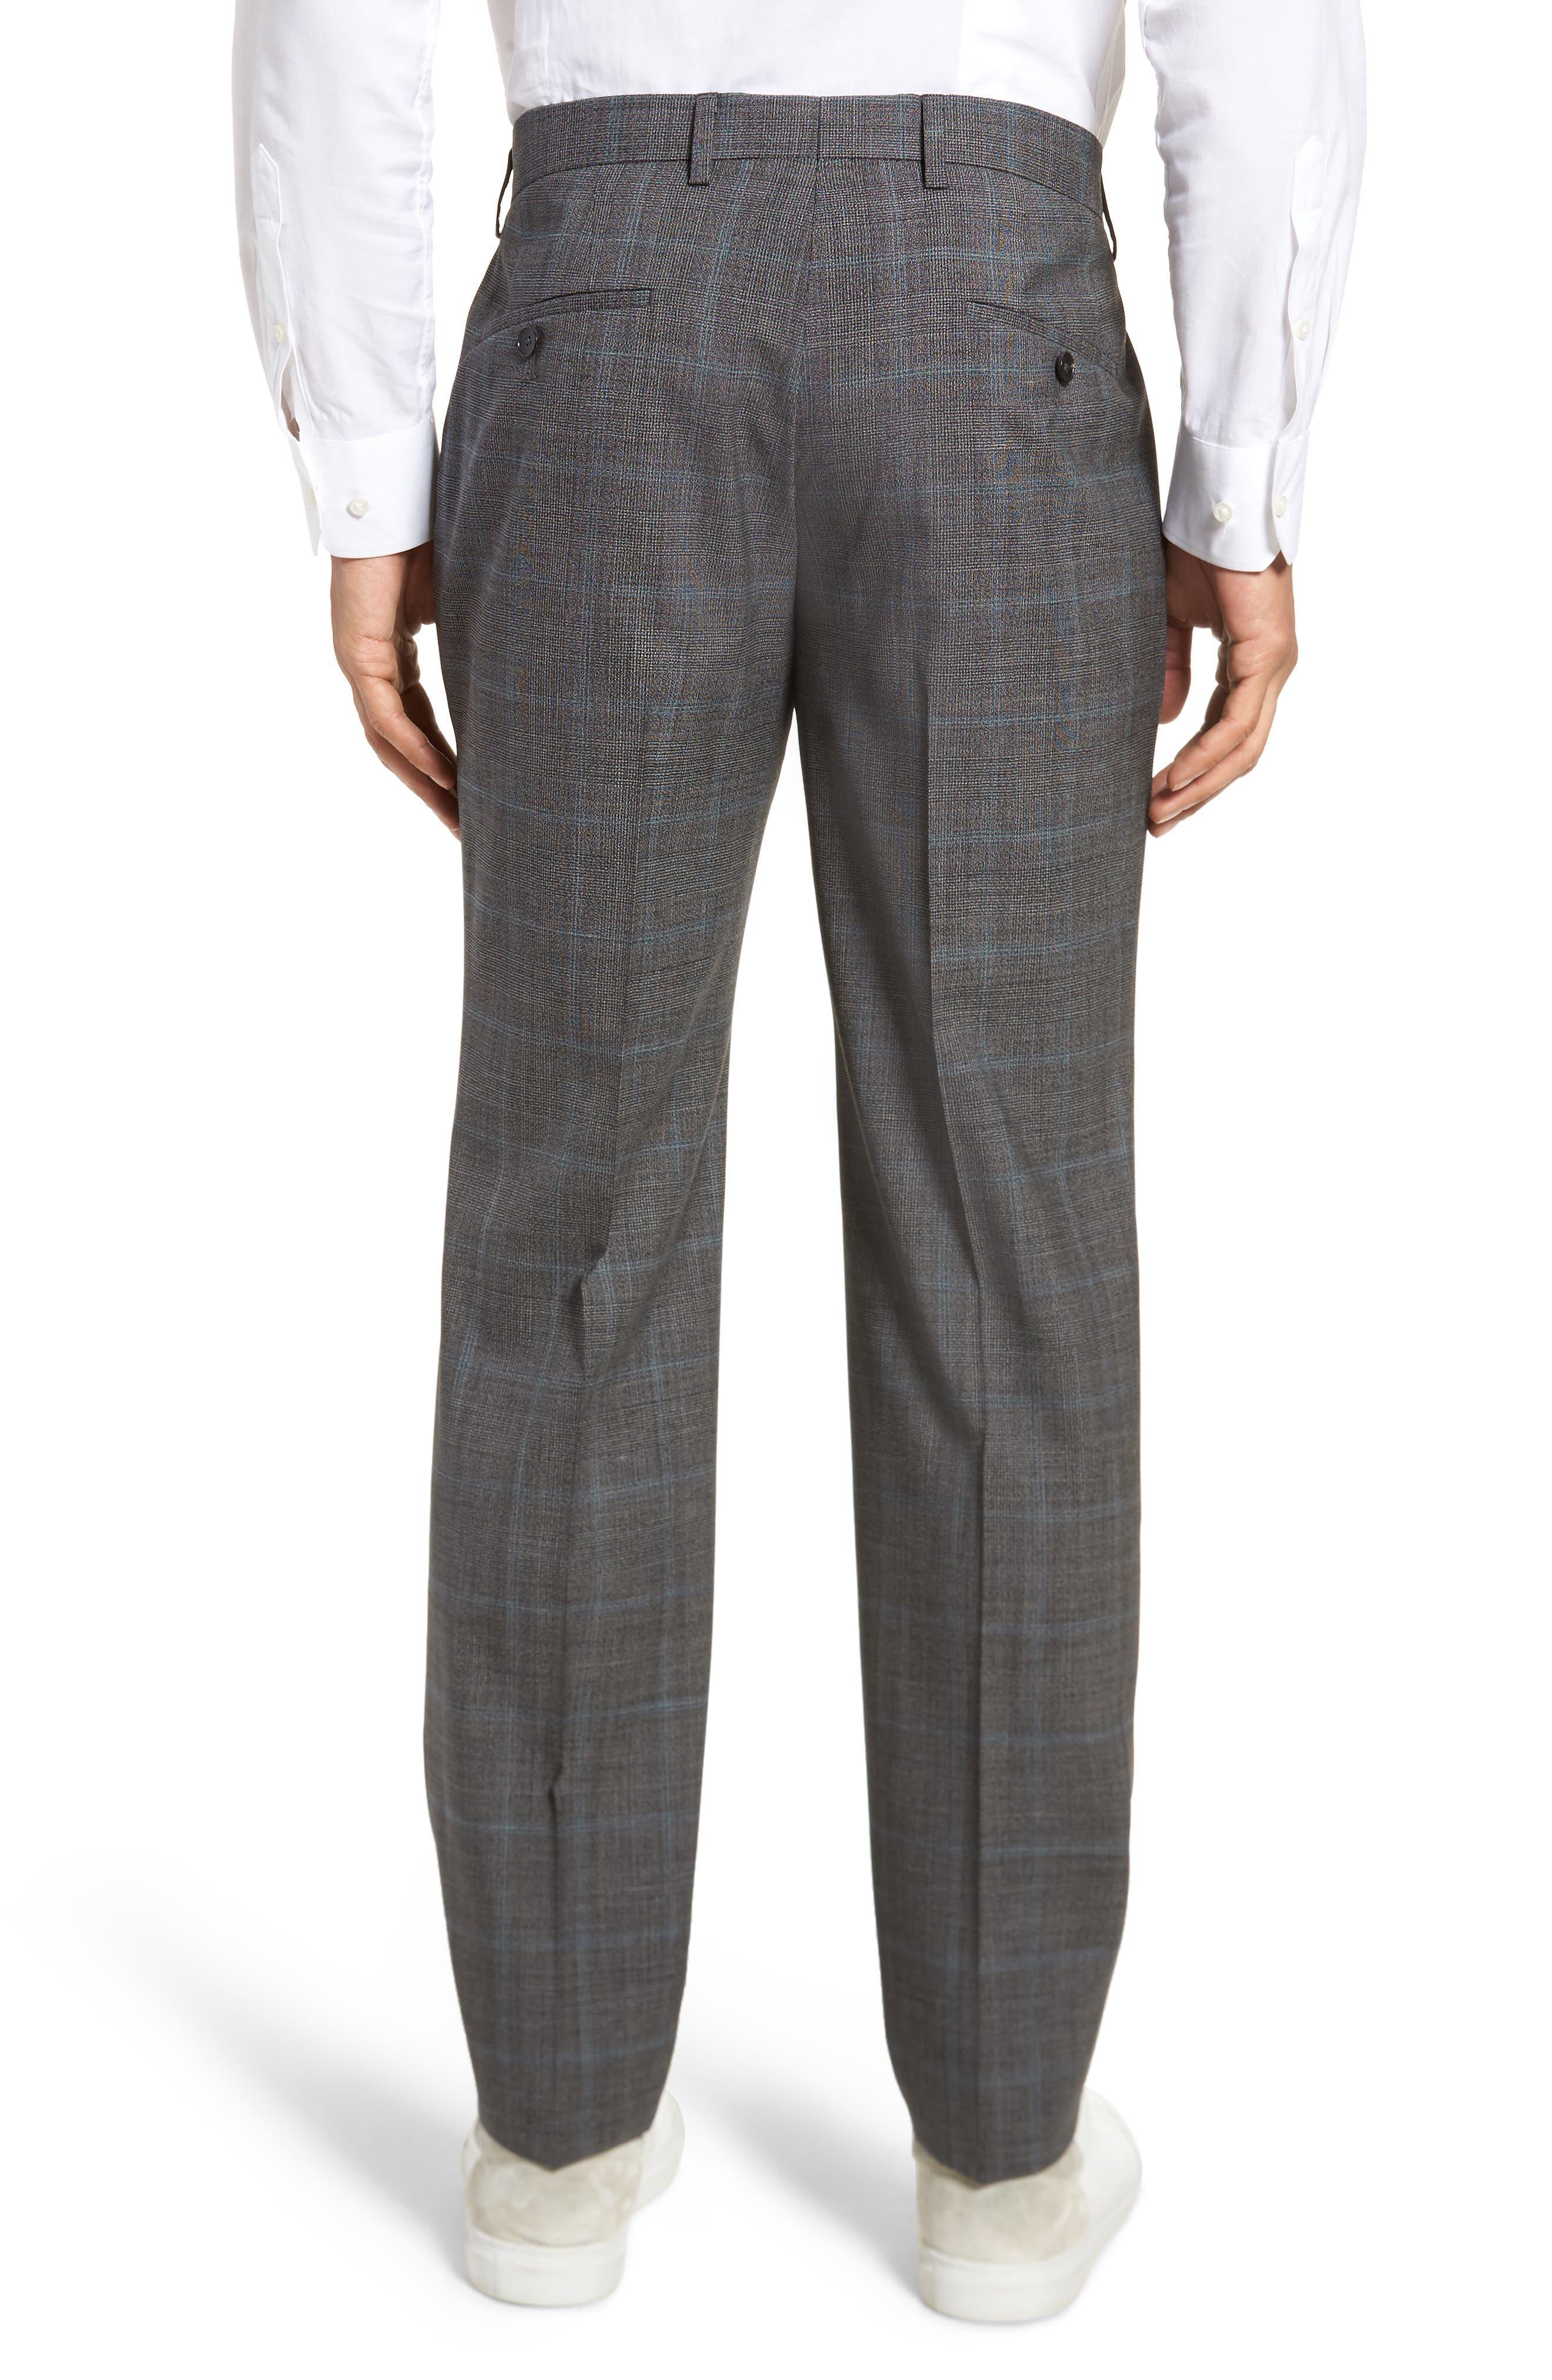 Genesis Flat Front Plaid Wool Trousers,                             Alternate thumbnail 2, color,                             061